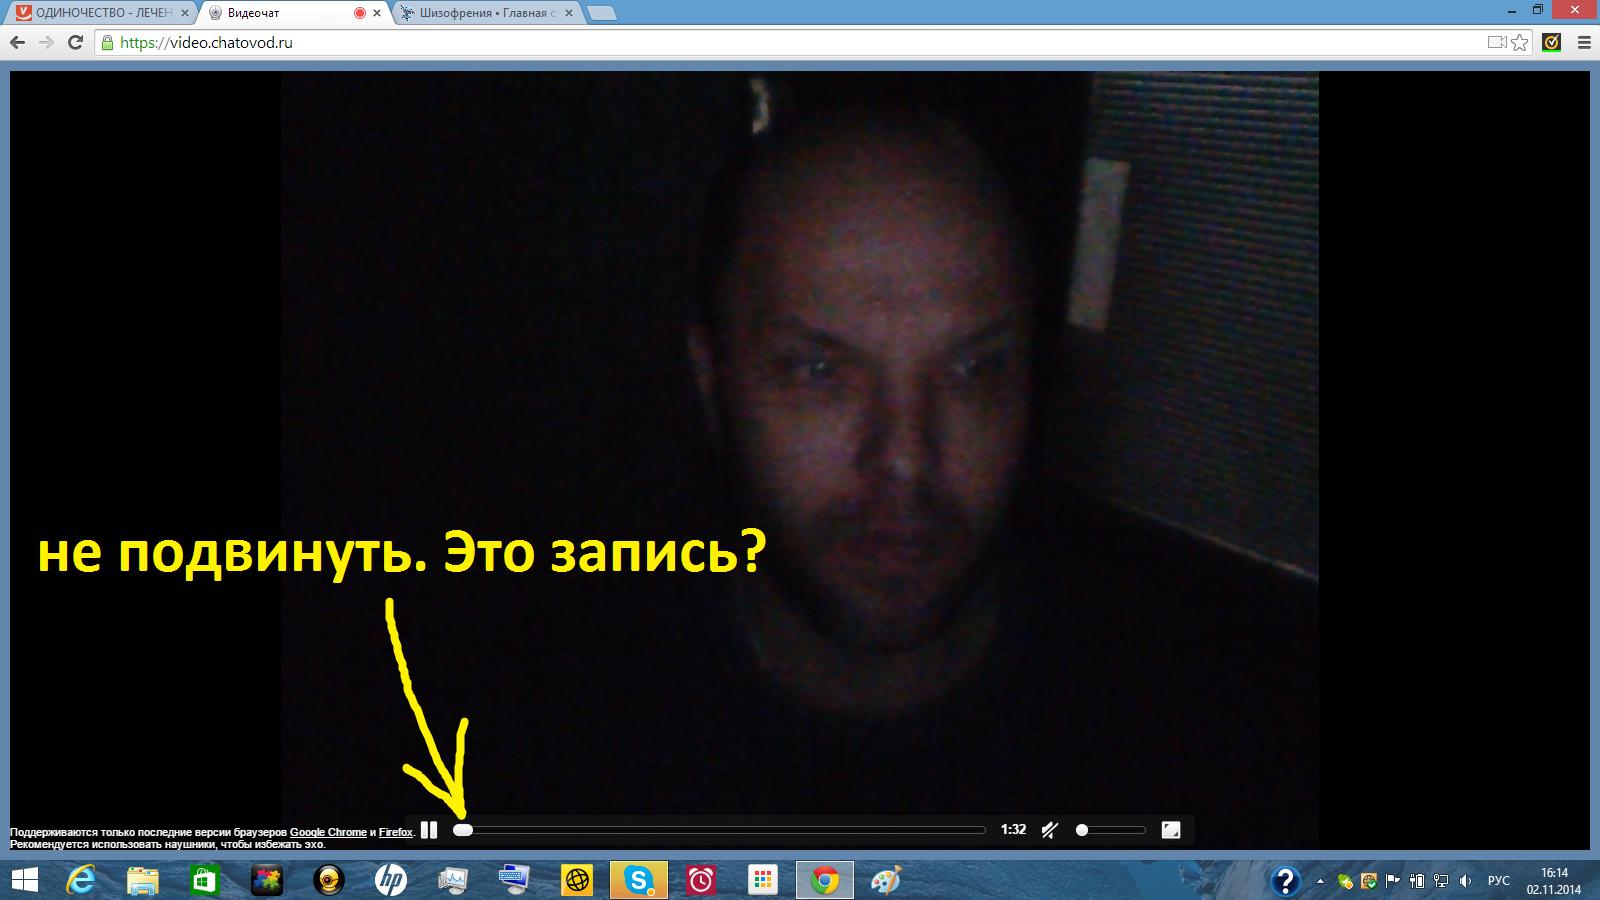 https://img-fotki.yandex.ru/get/12/246246705.1/0_10615b_f24e0954_orig.png